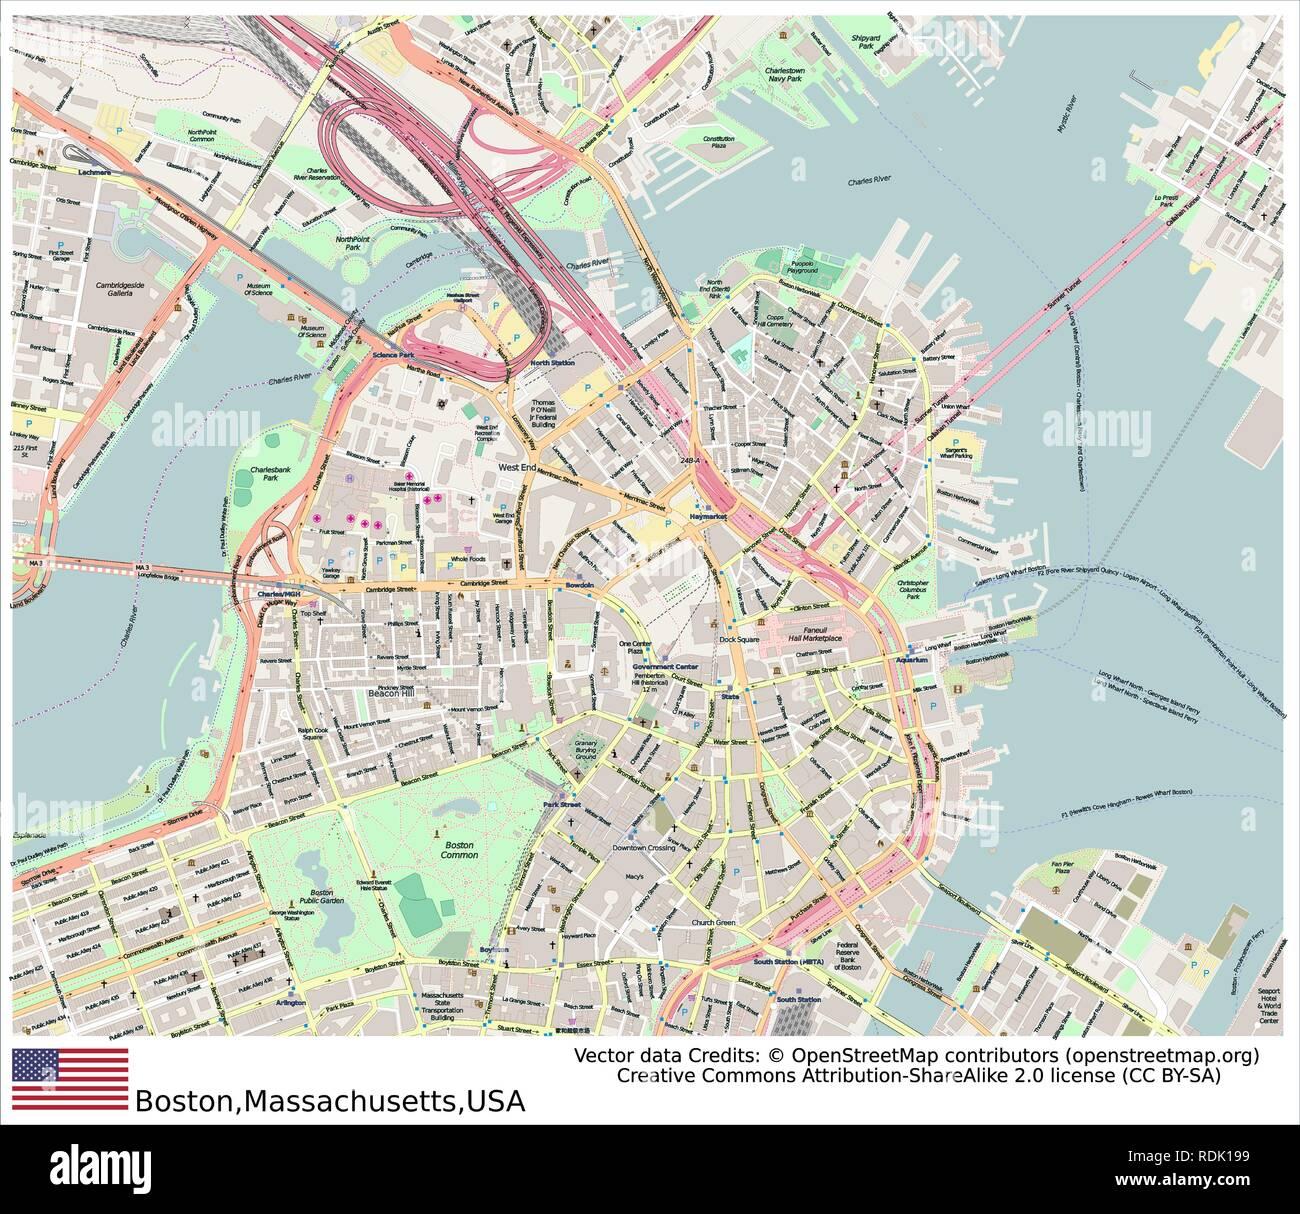 Boston,Massachusetts,United States, - Stock Vector